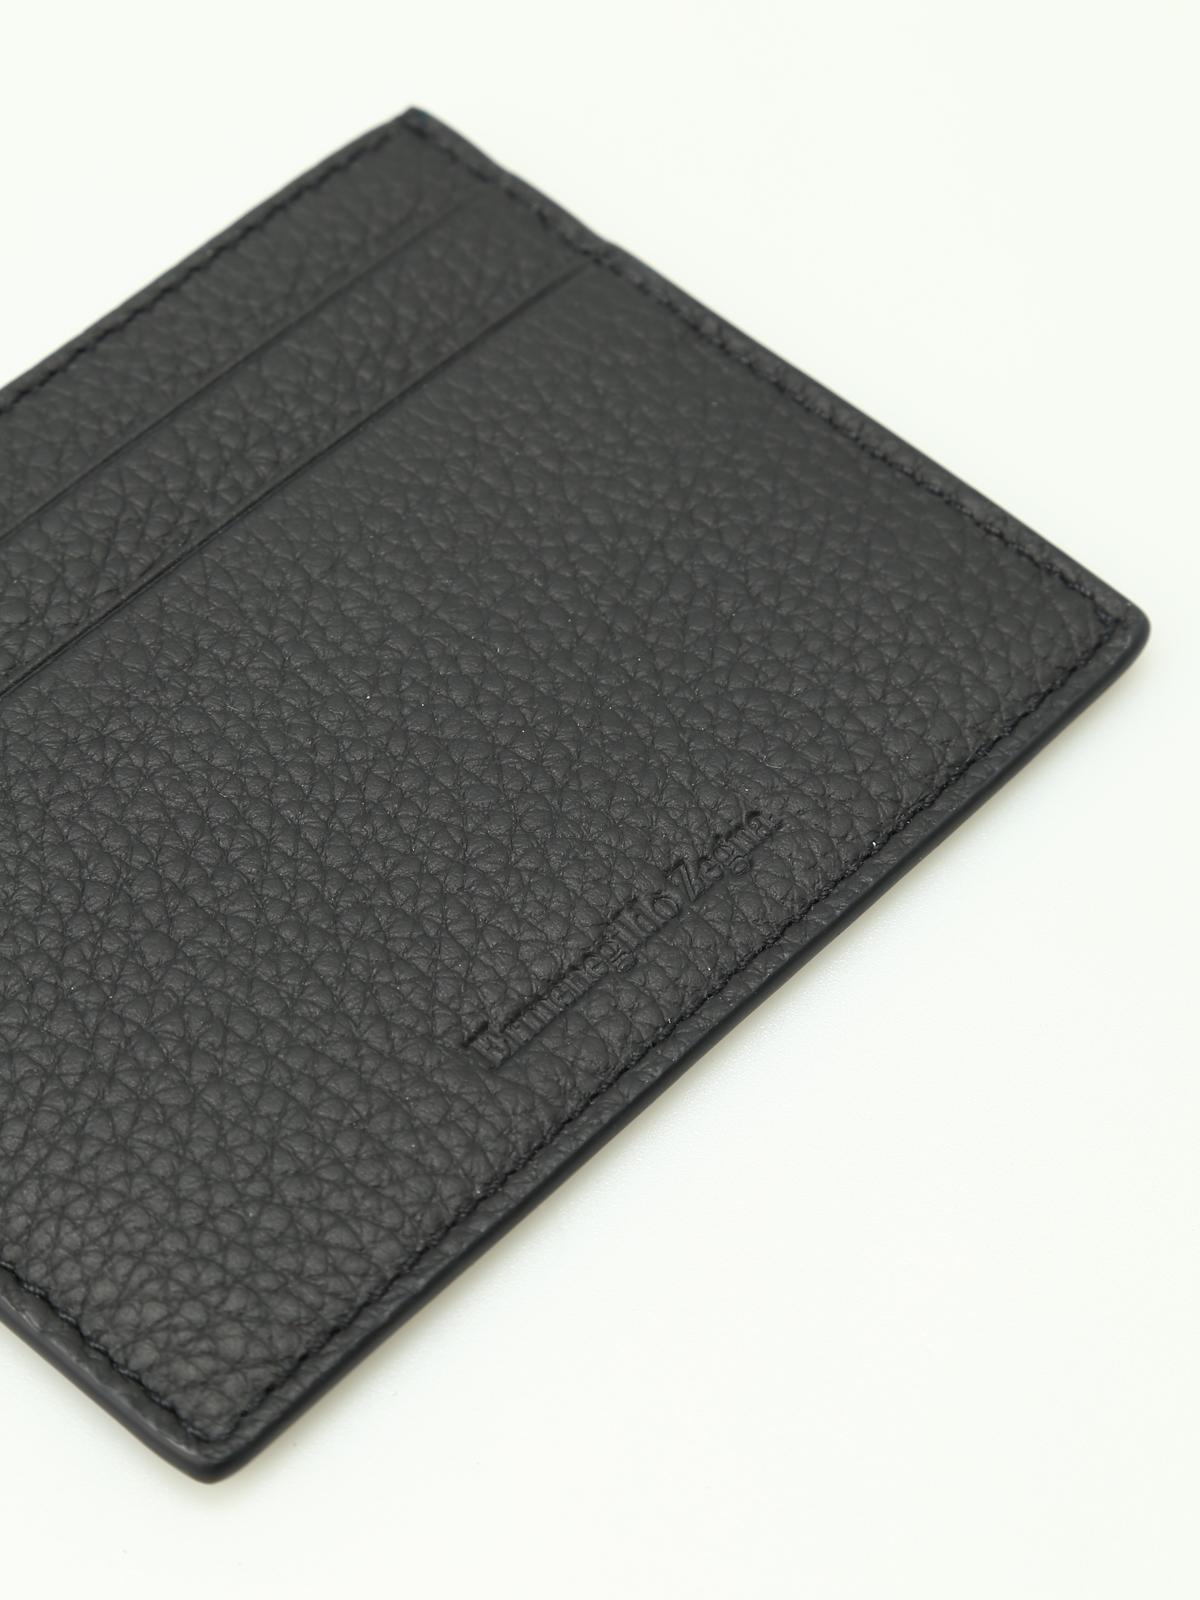 Hammered leather card holder by ermenegildo zegna wallets purses ikrix ermenegildo zegna wallets purses hammered leather card holder reheart Images